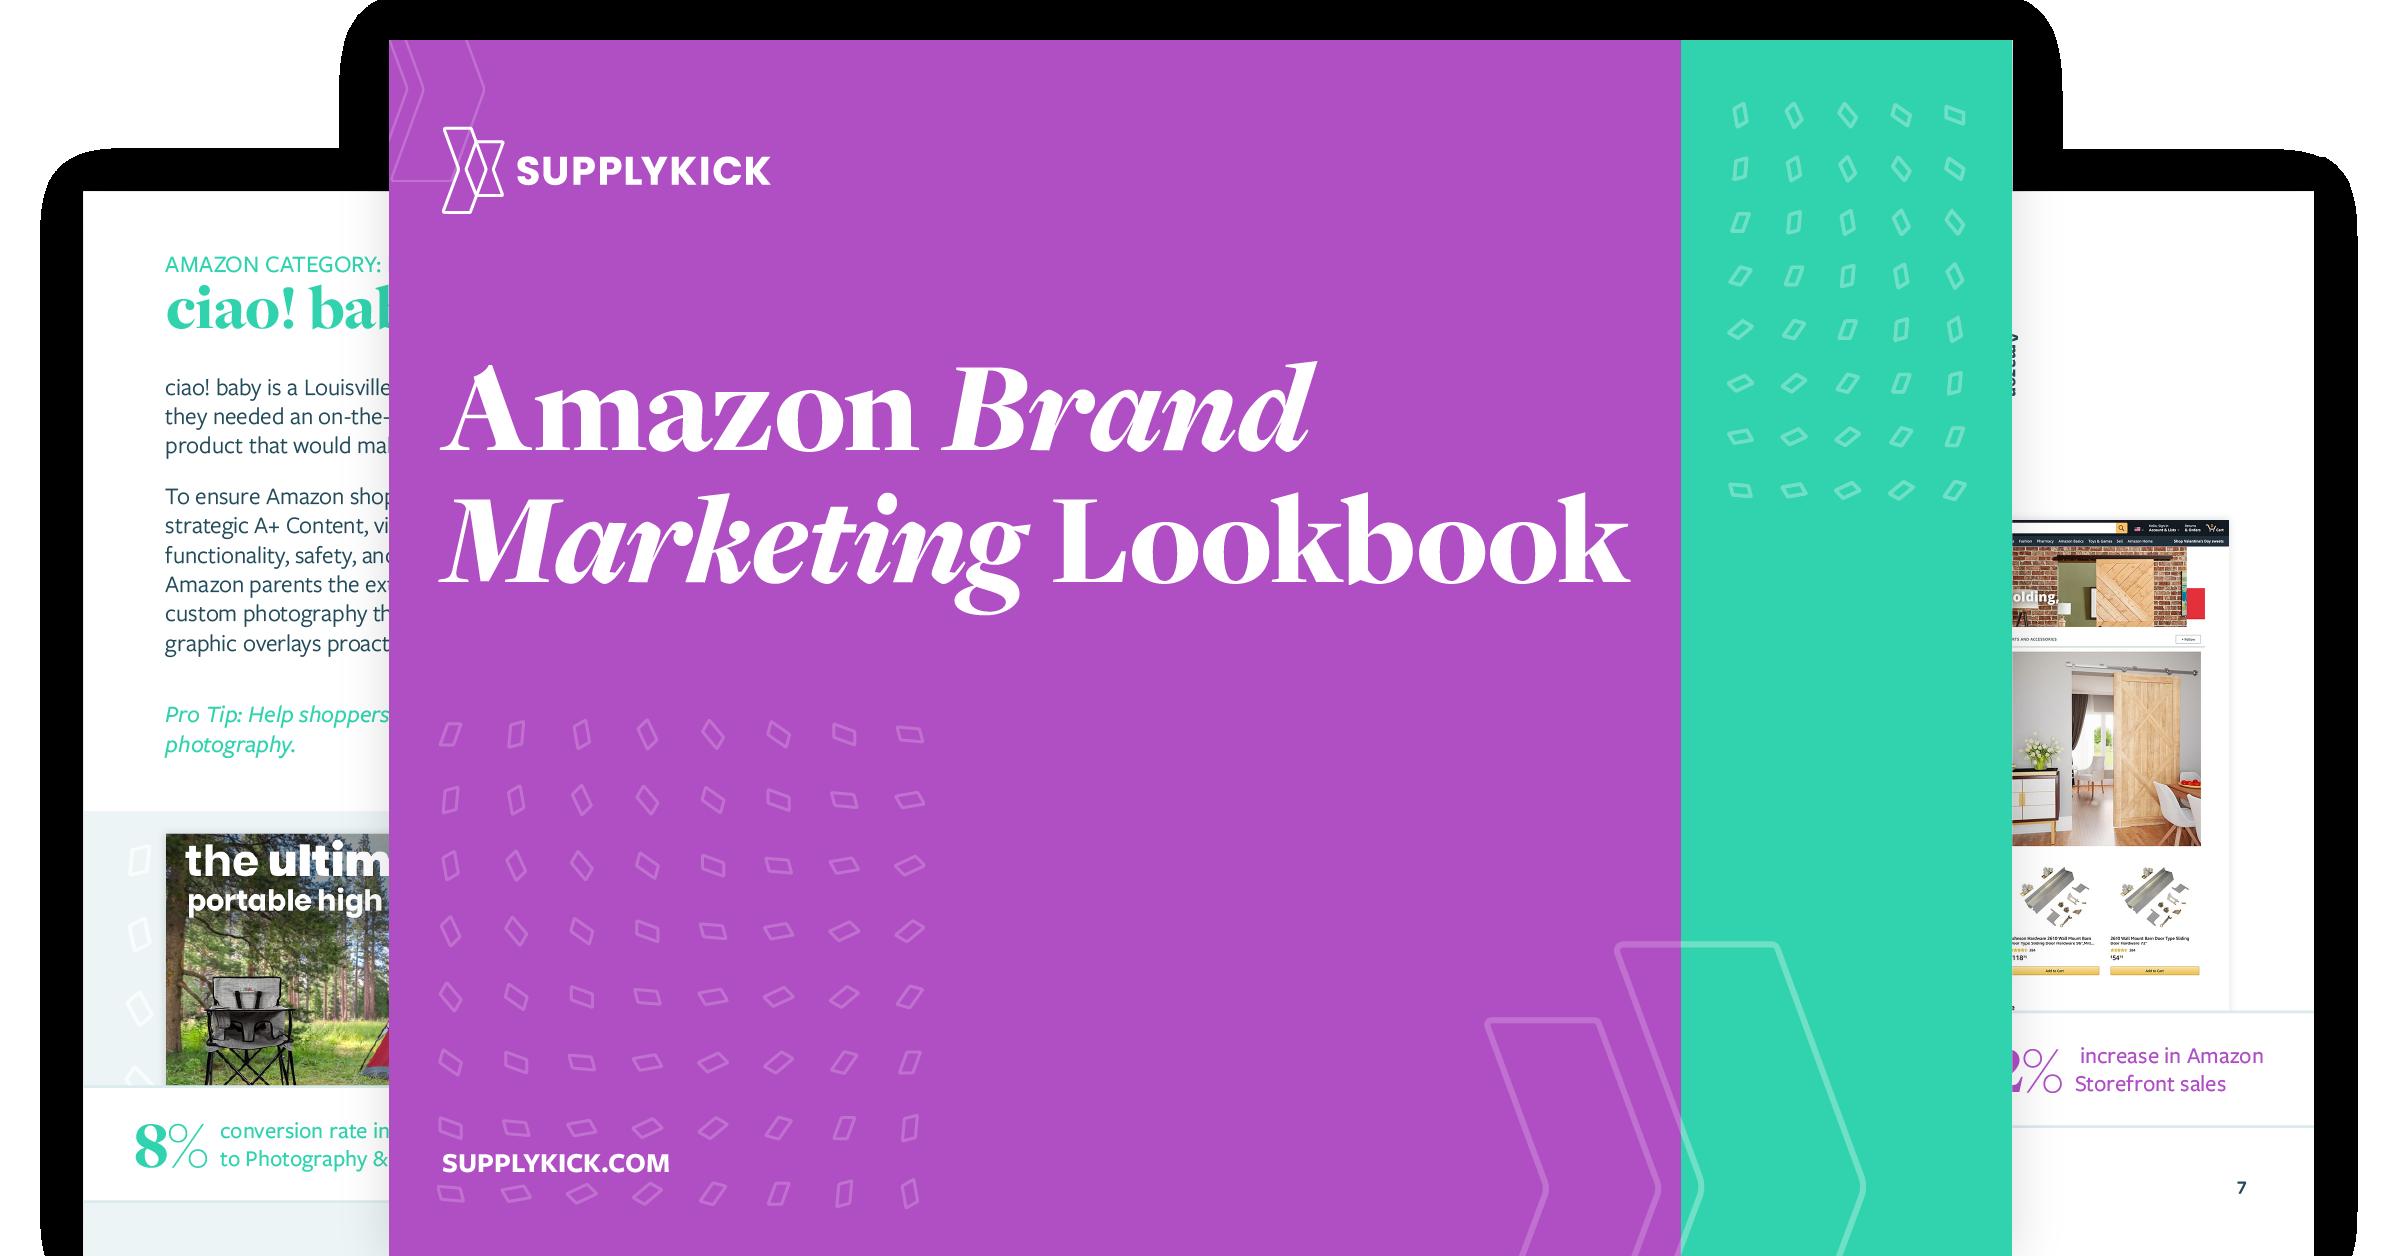 Marketing-Lookbook-Downloads